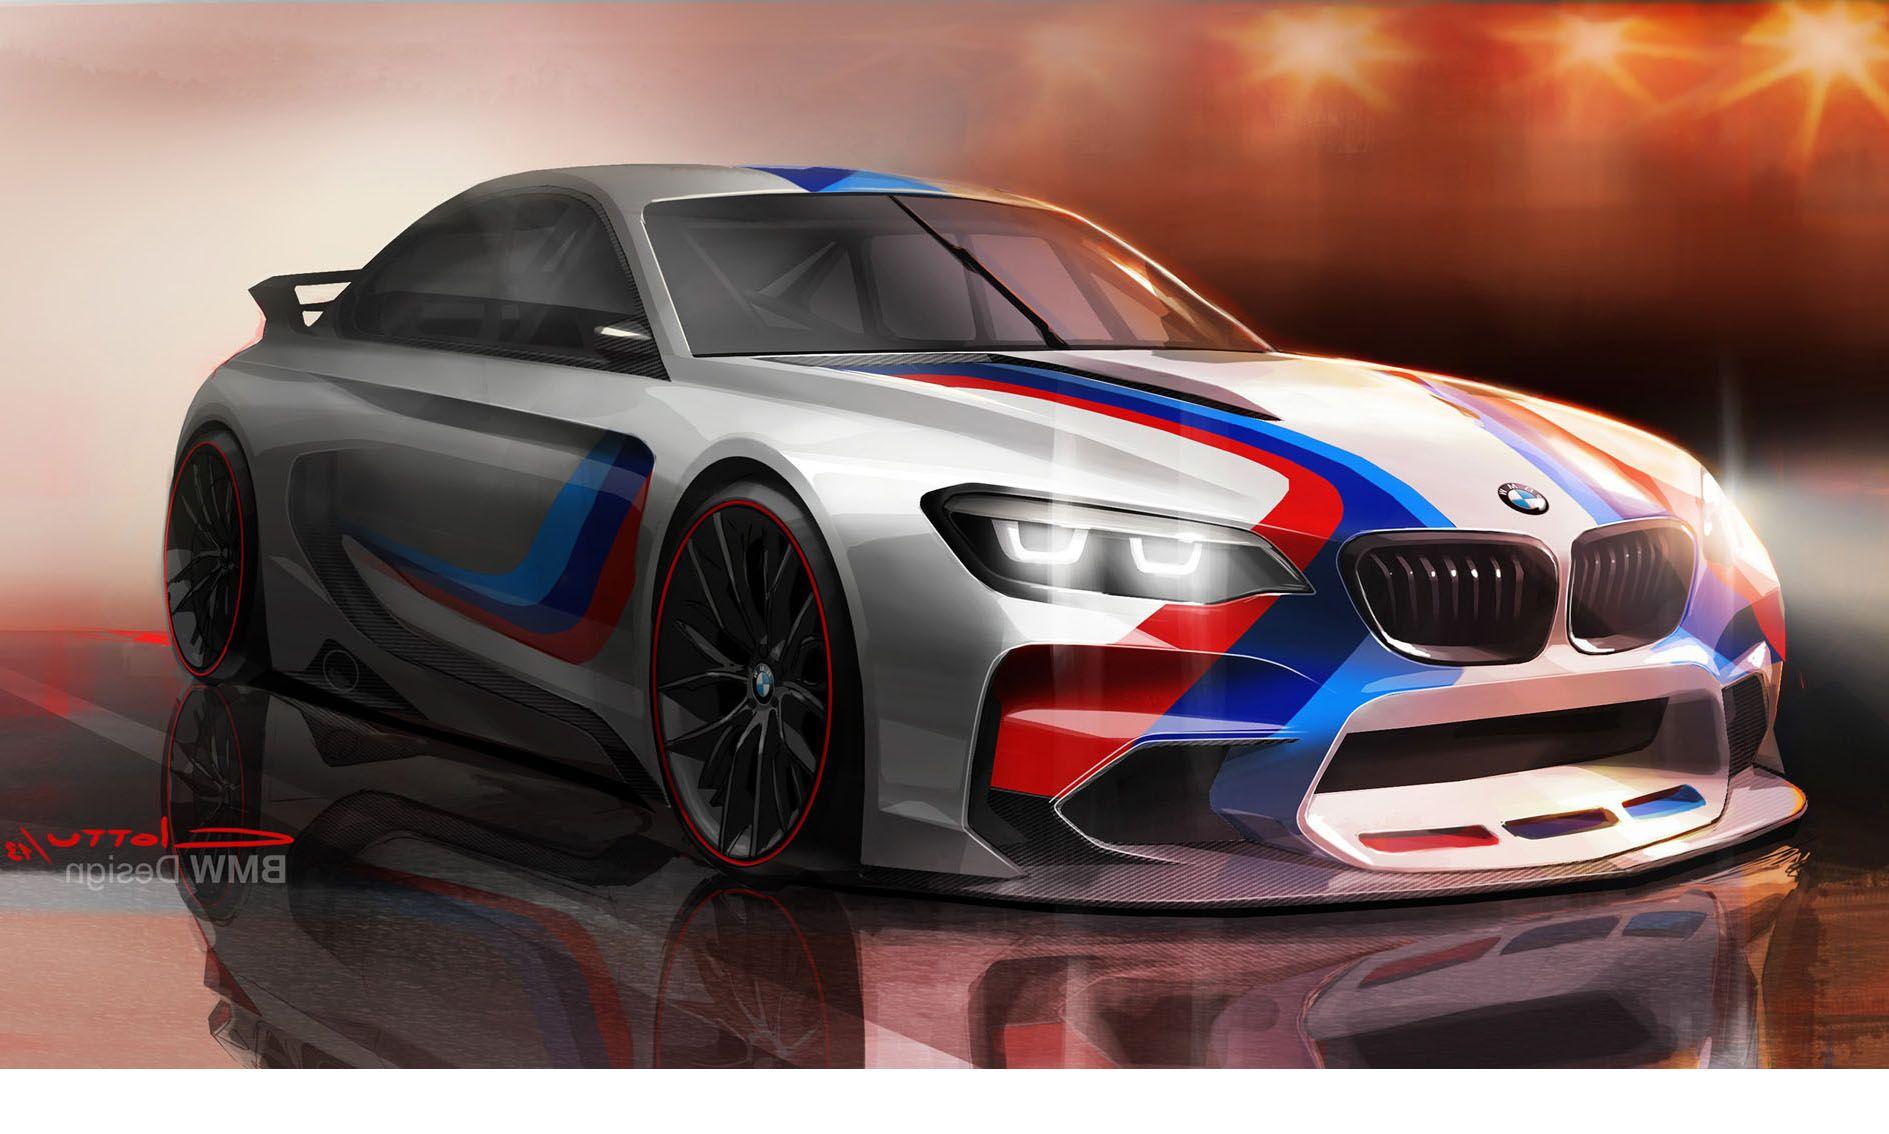 Wallpaper Bmw Vision Next Future Cars Interior Cars Bikes